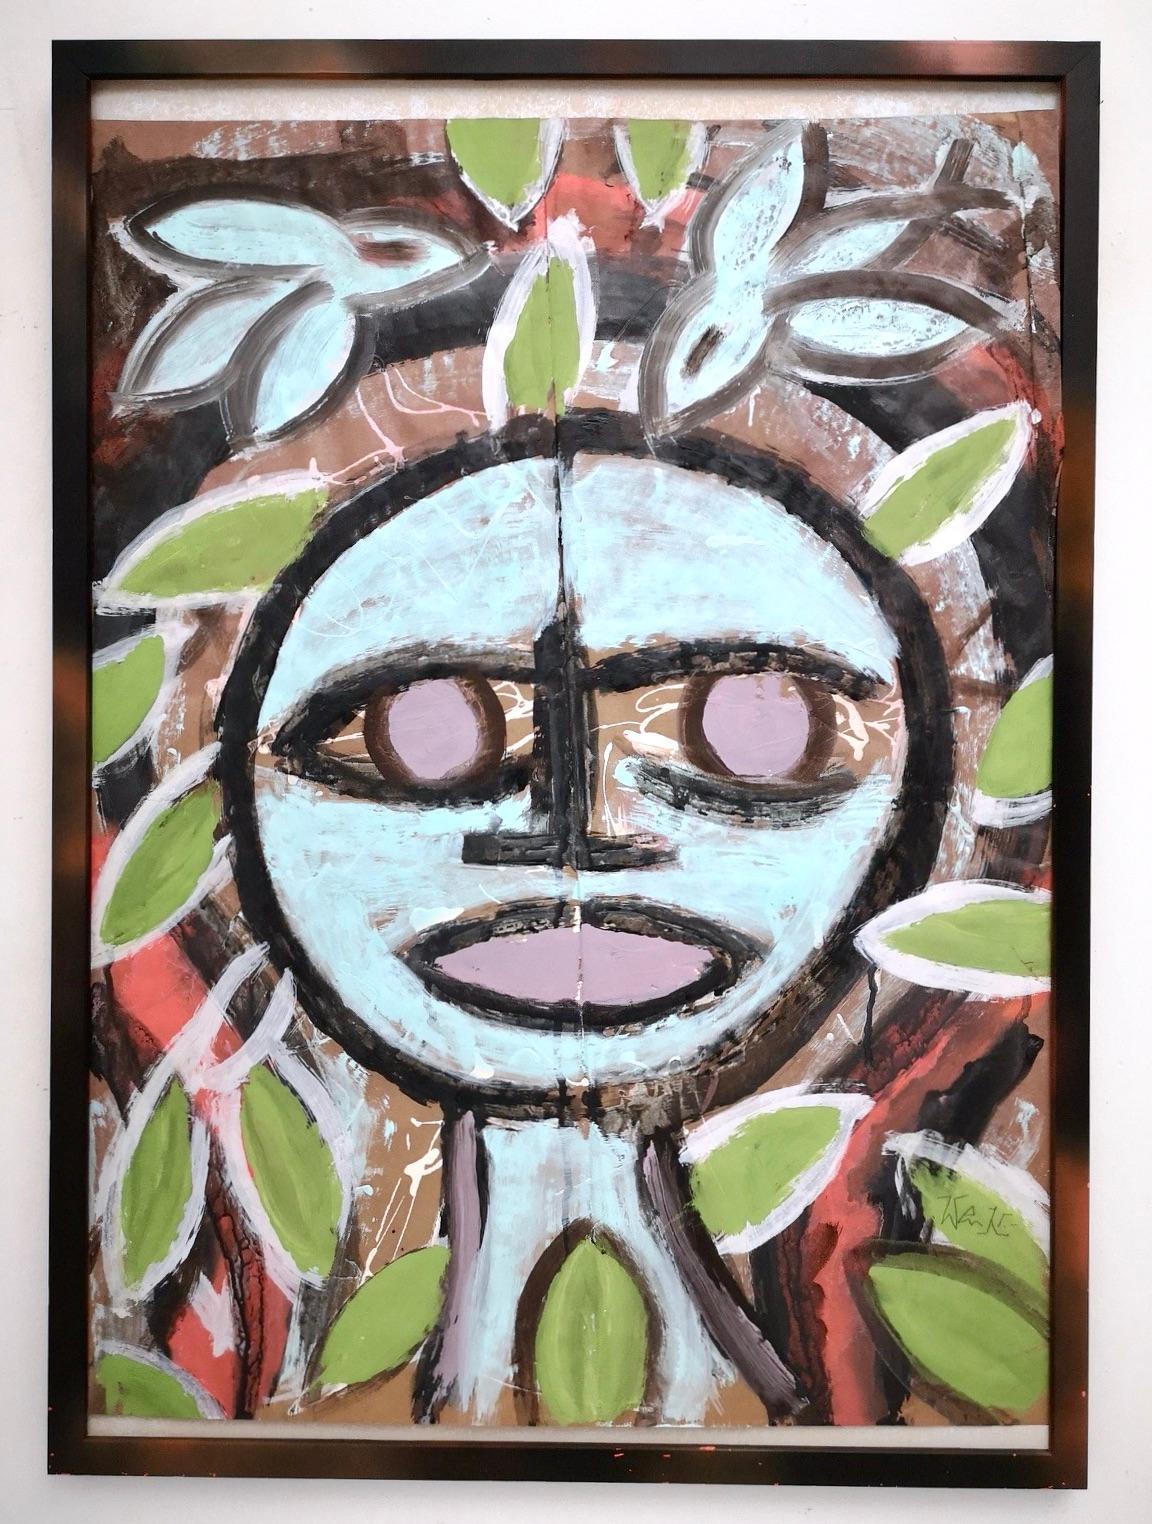 """Viso Tondo Celeste"" by Enzio Wenk, 2018 - Acrylic on Paper, Neo-Expressionism"